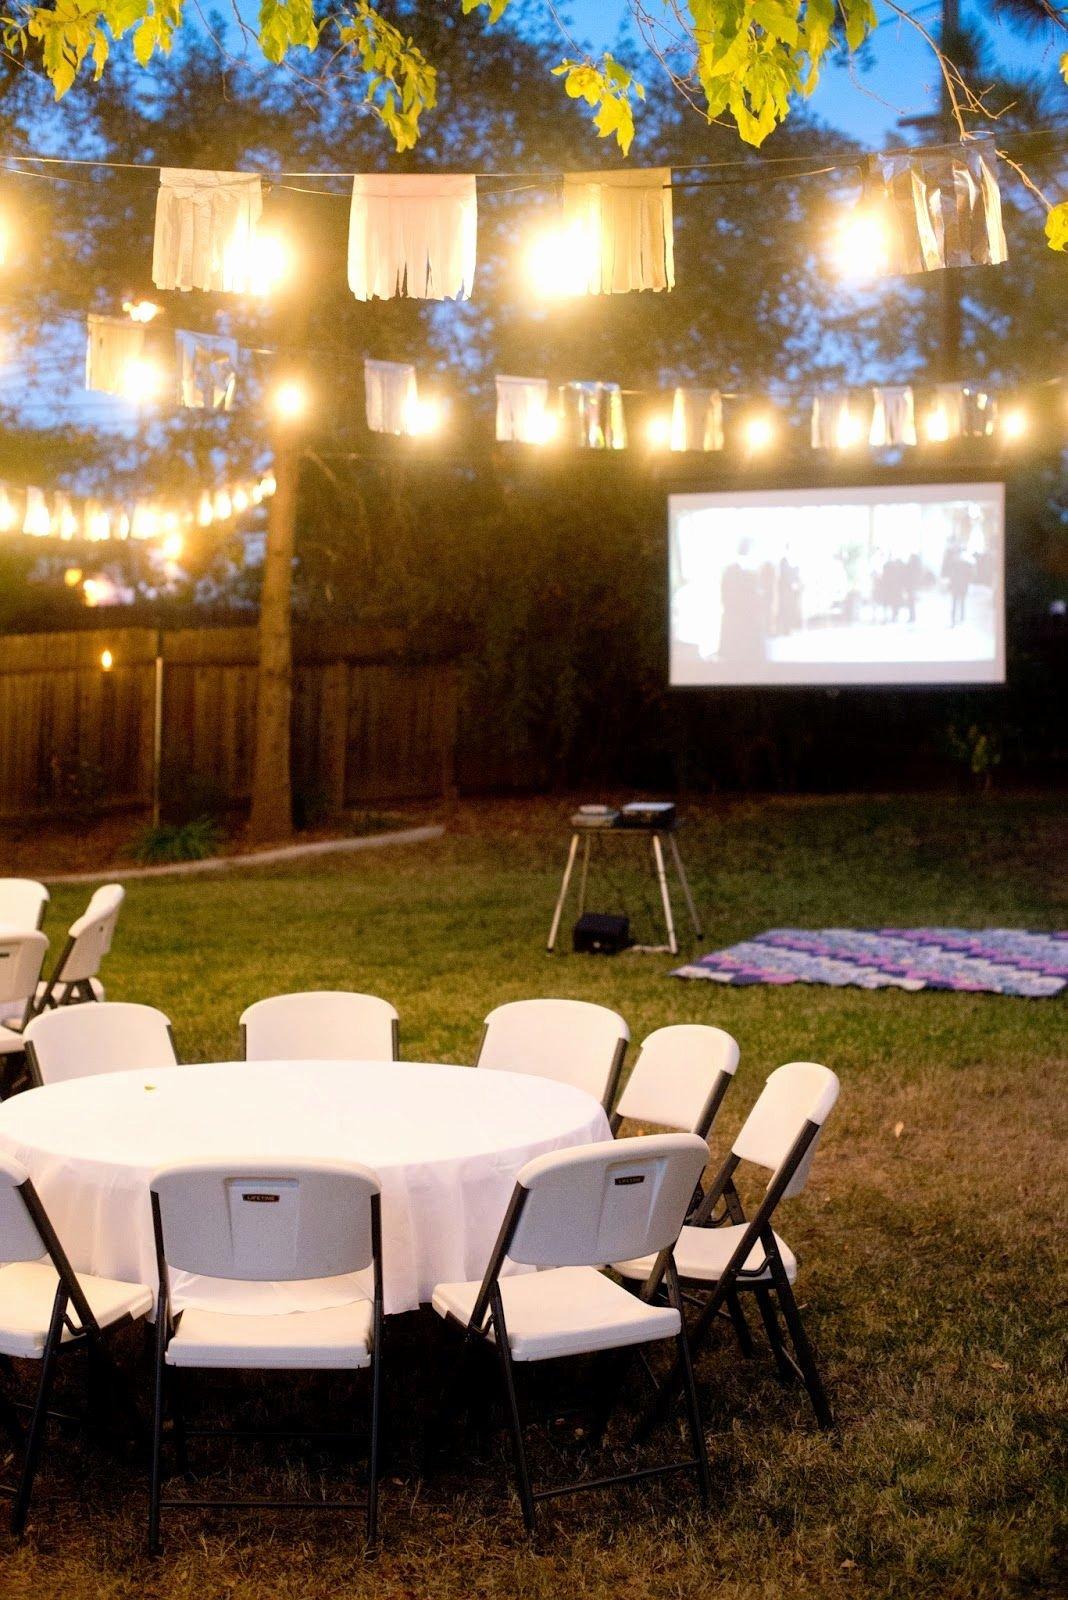 Backyard Birthday Decoration Ideas Unique Fall Backyard Birthday Party and Movie Night